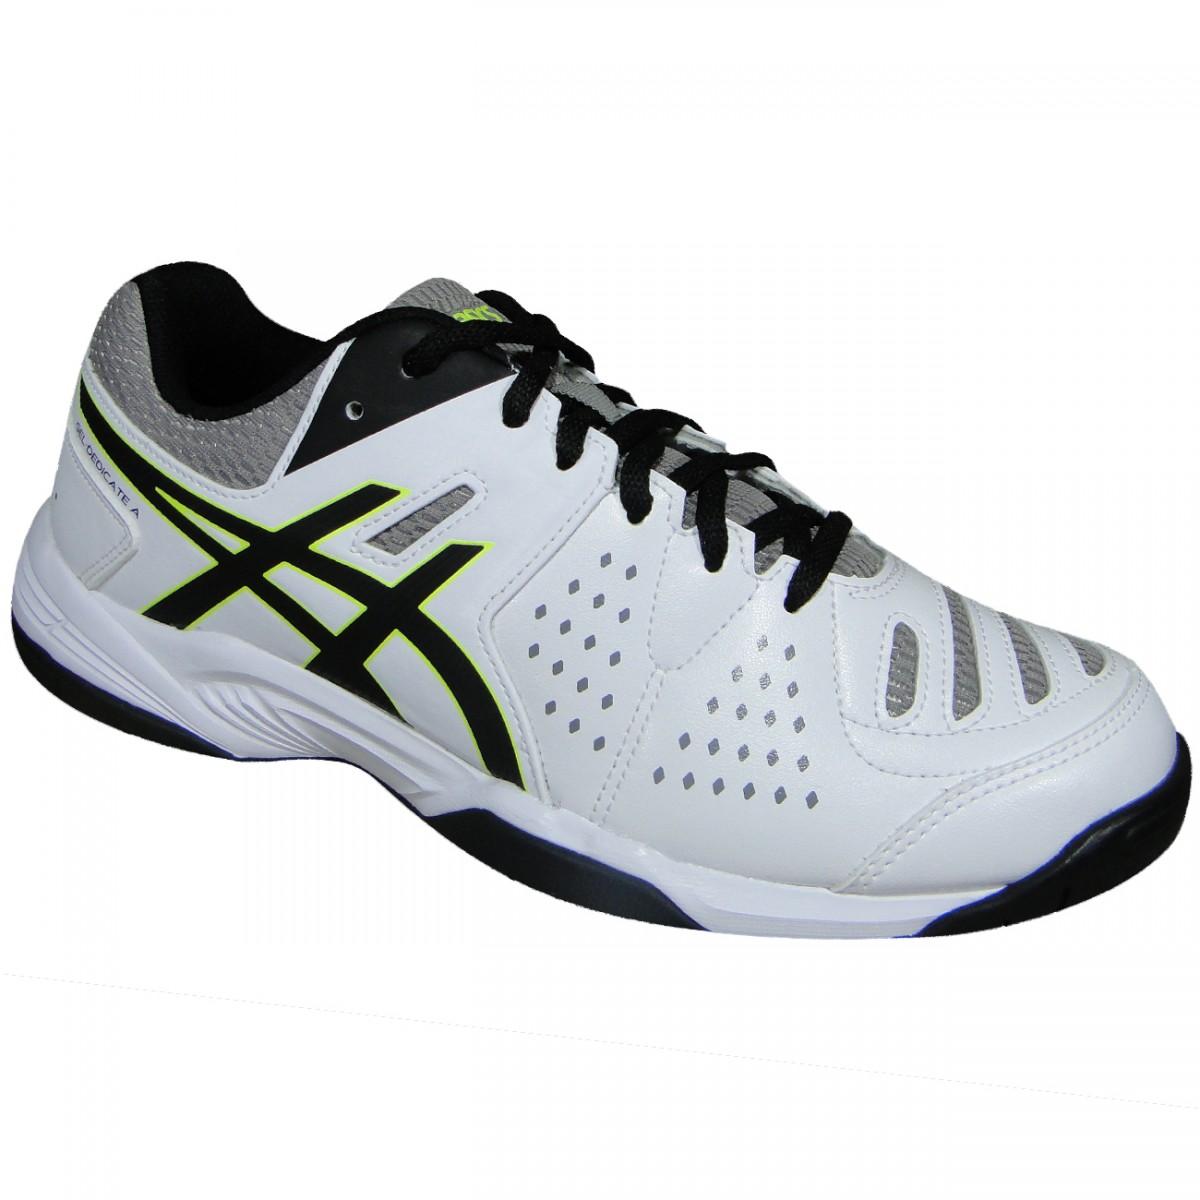 Tenis Asics Gel-Dedicate 4 T002B 0190 - Branco Preto Limão - Chuteira Nike 291f18a49815c